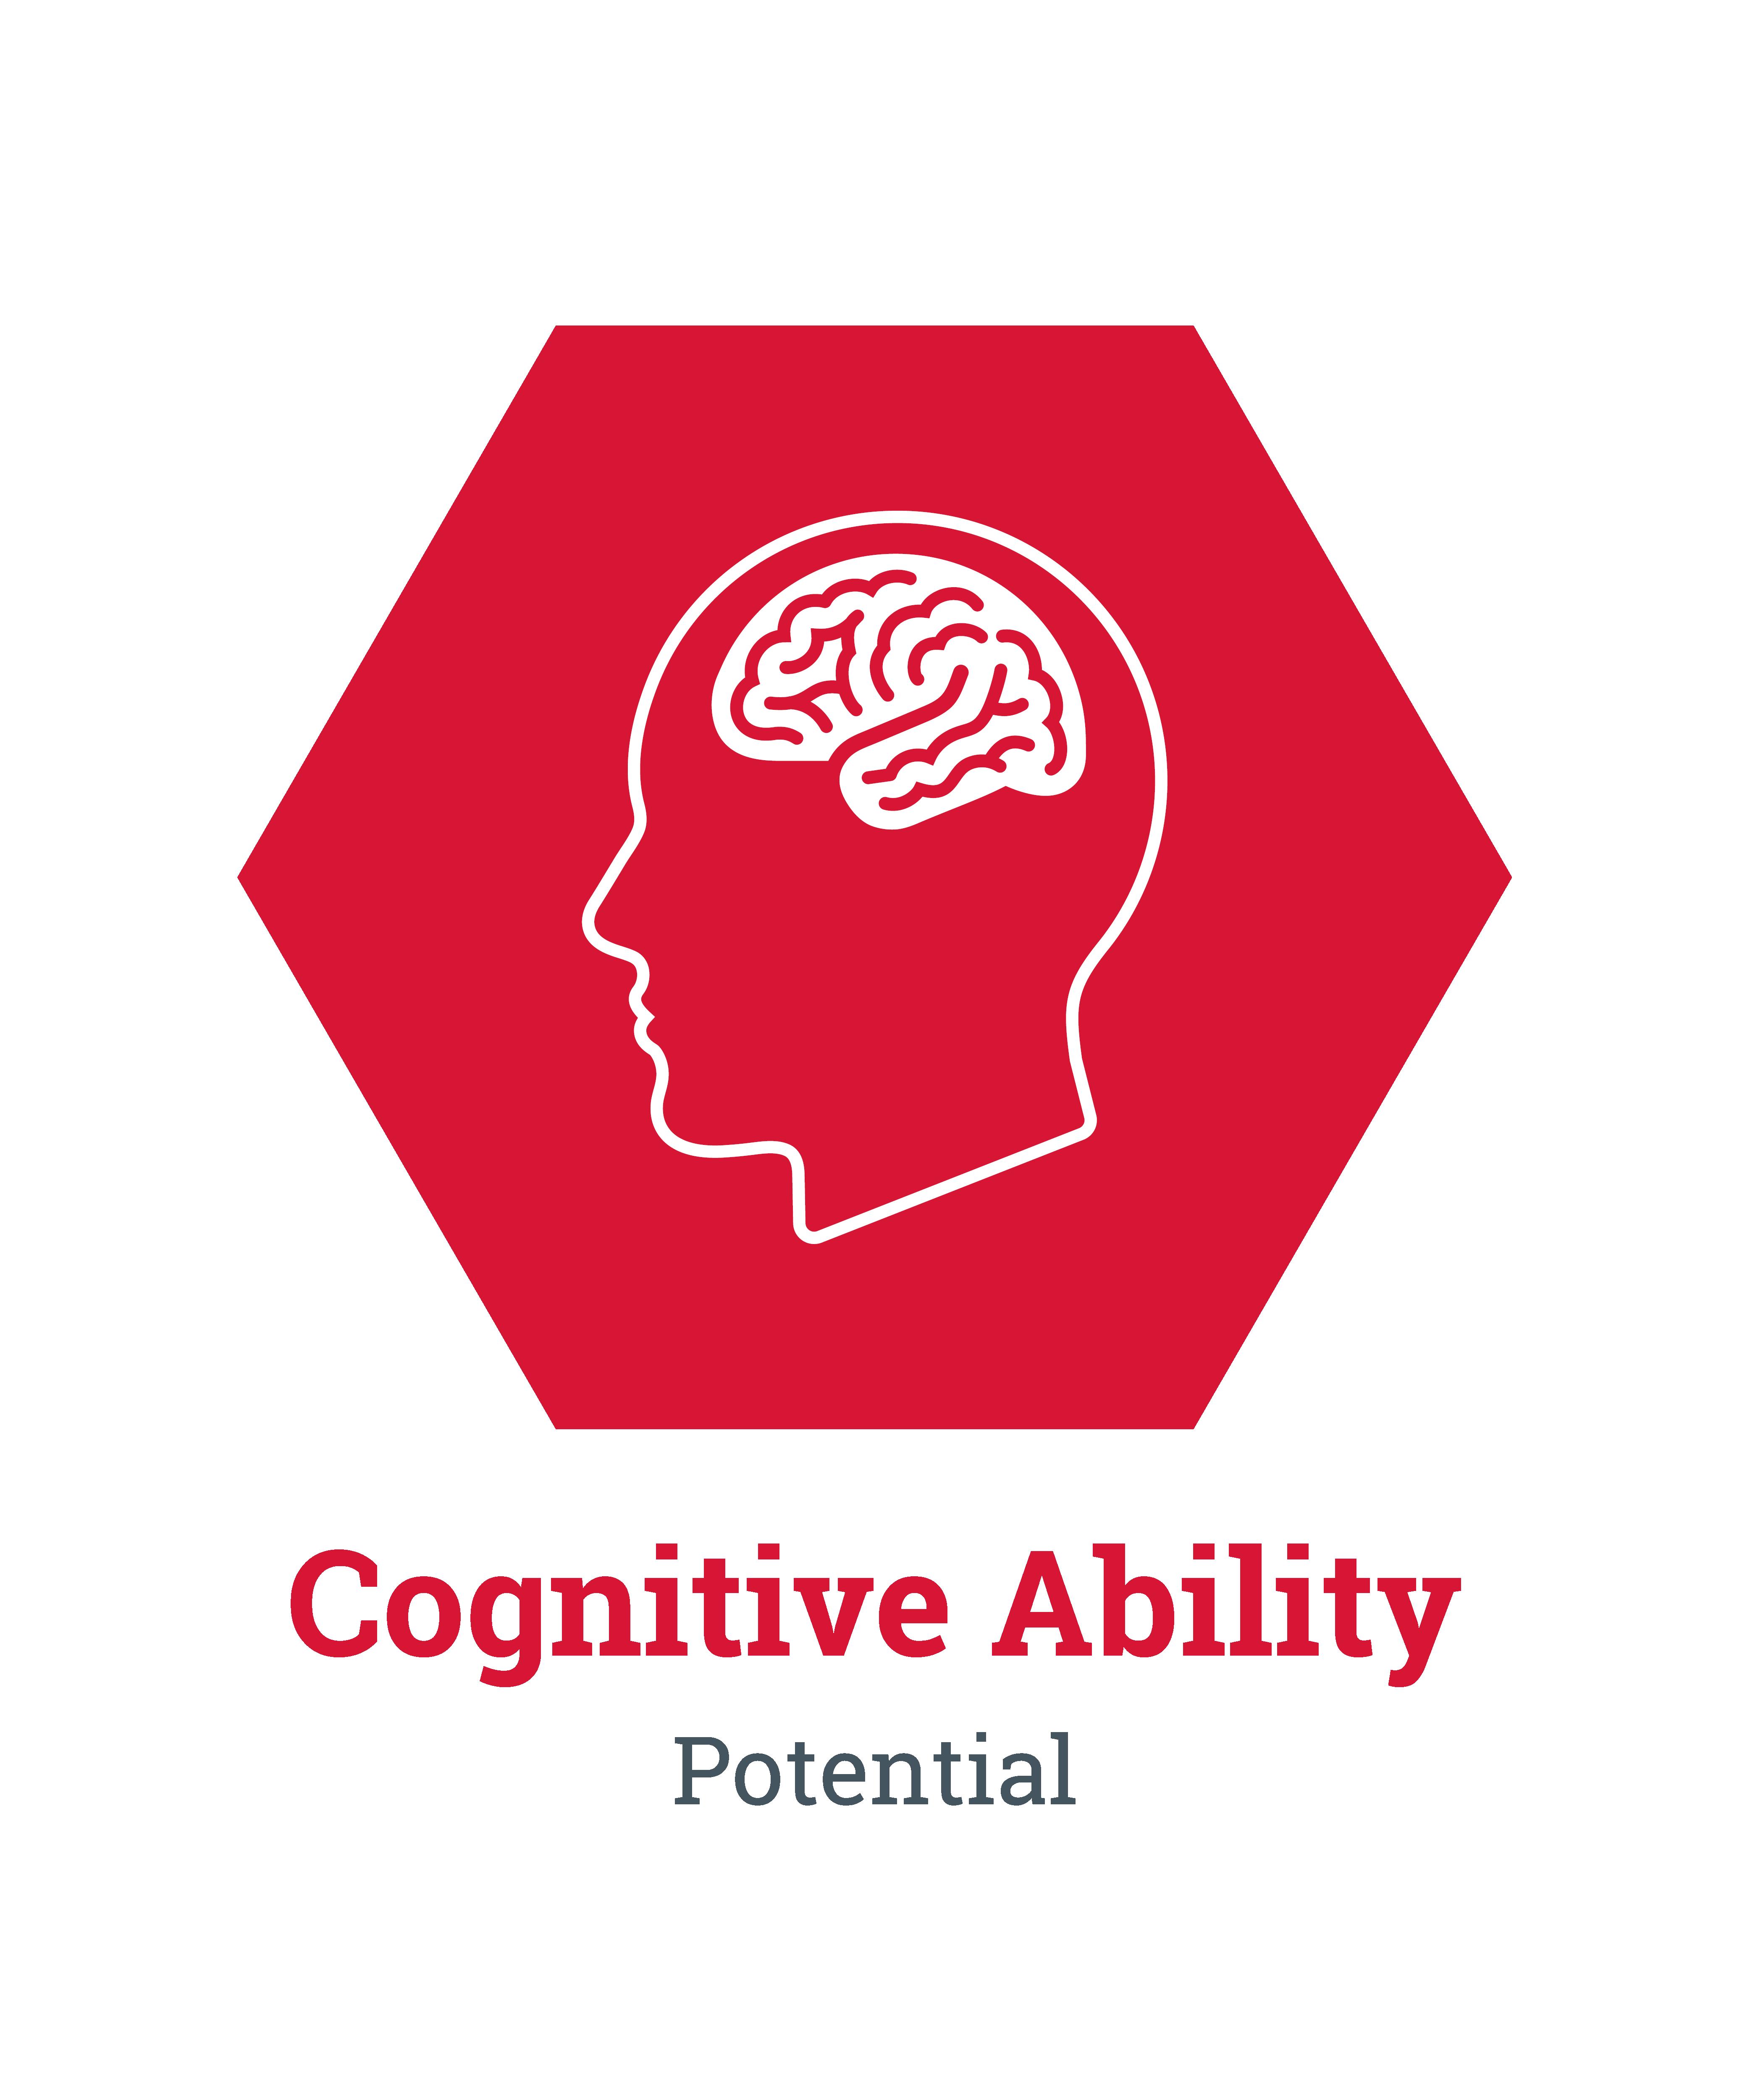 Cognitive Ability. Potential